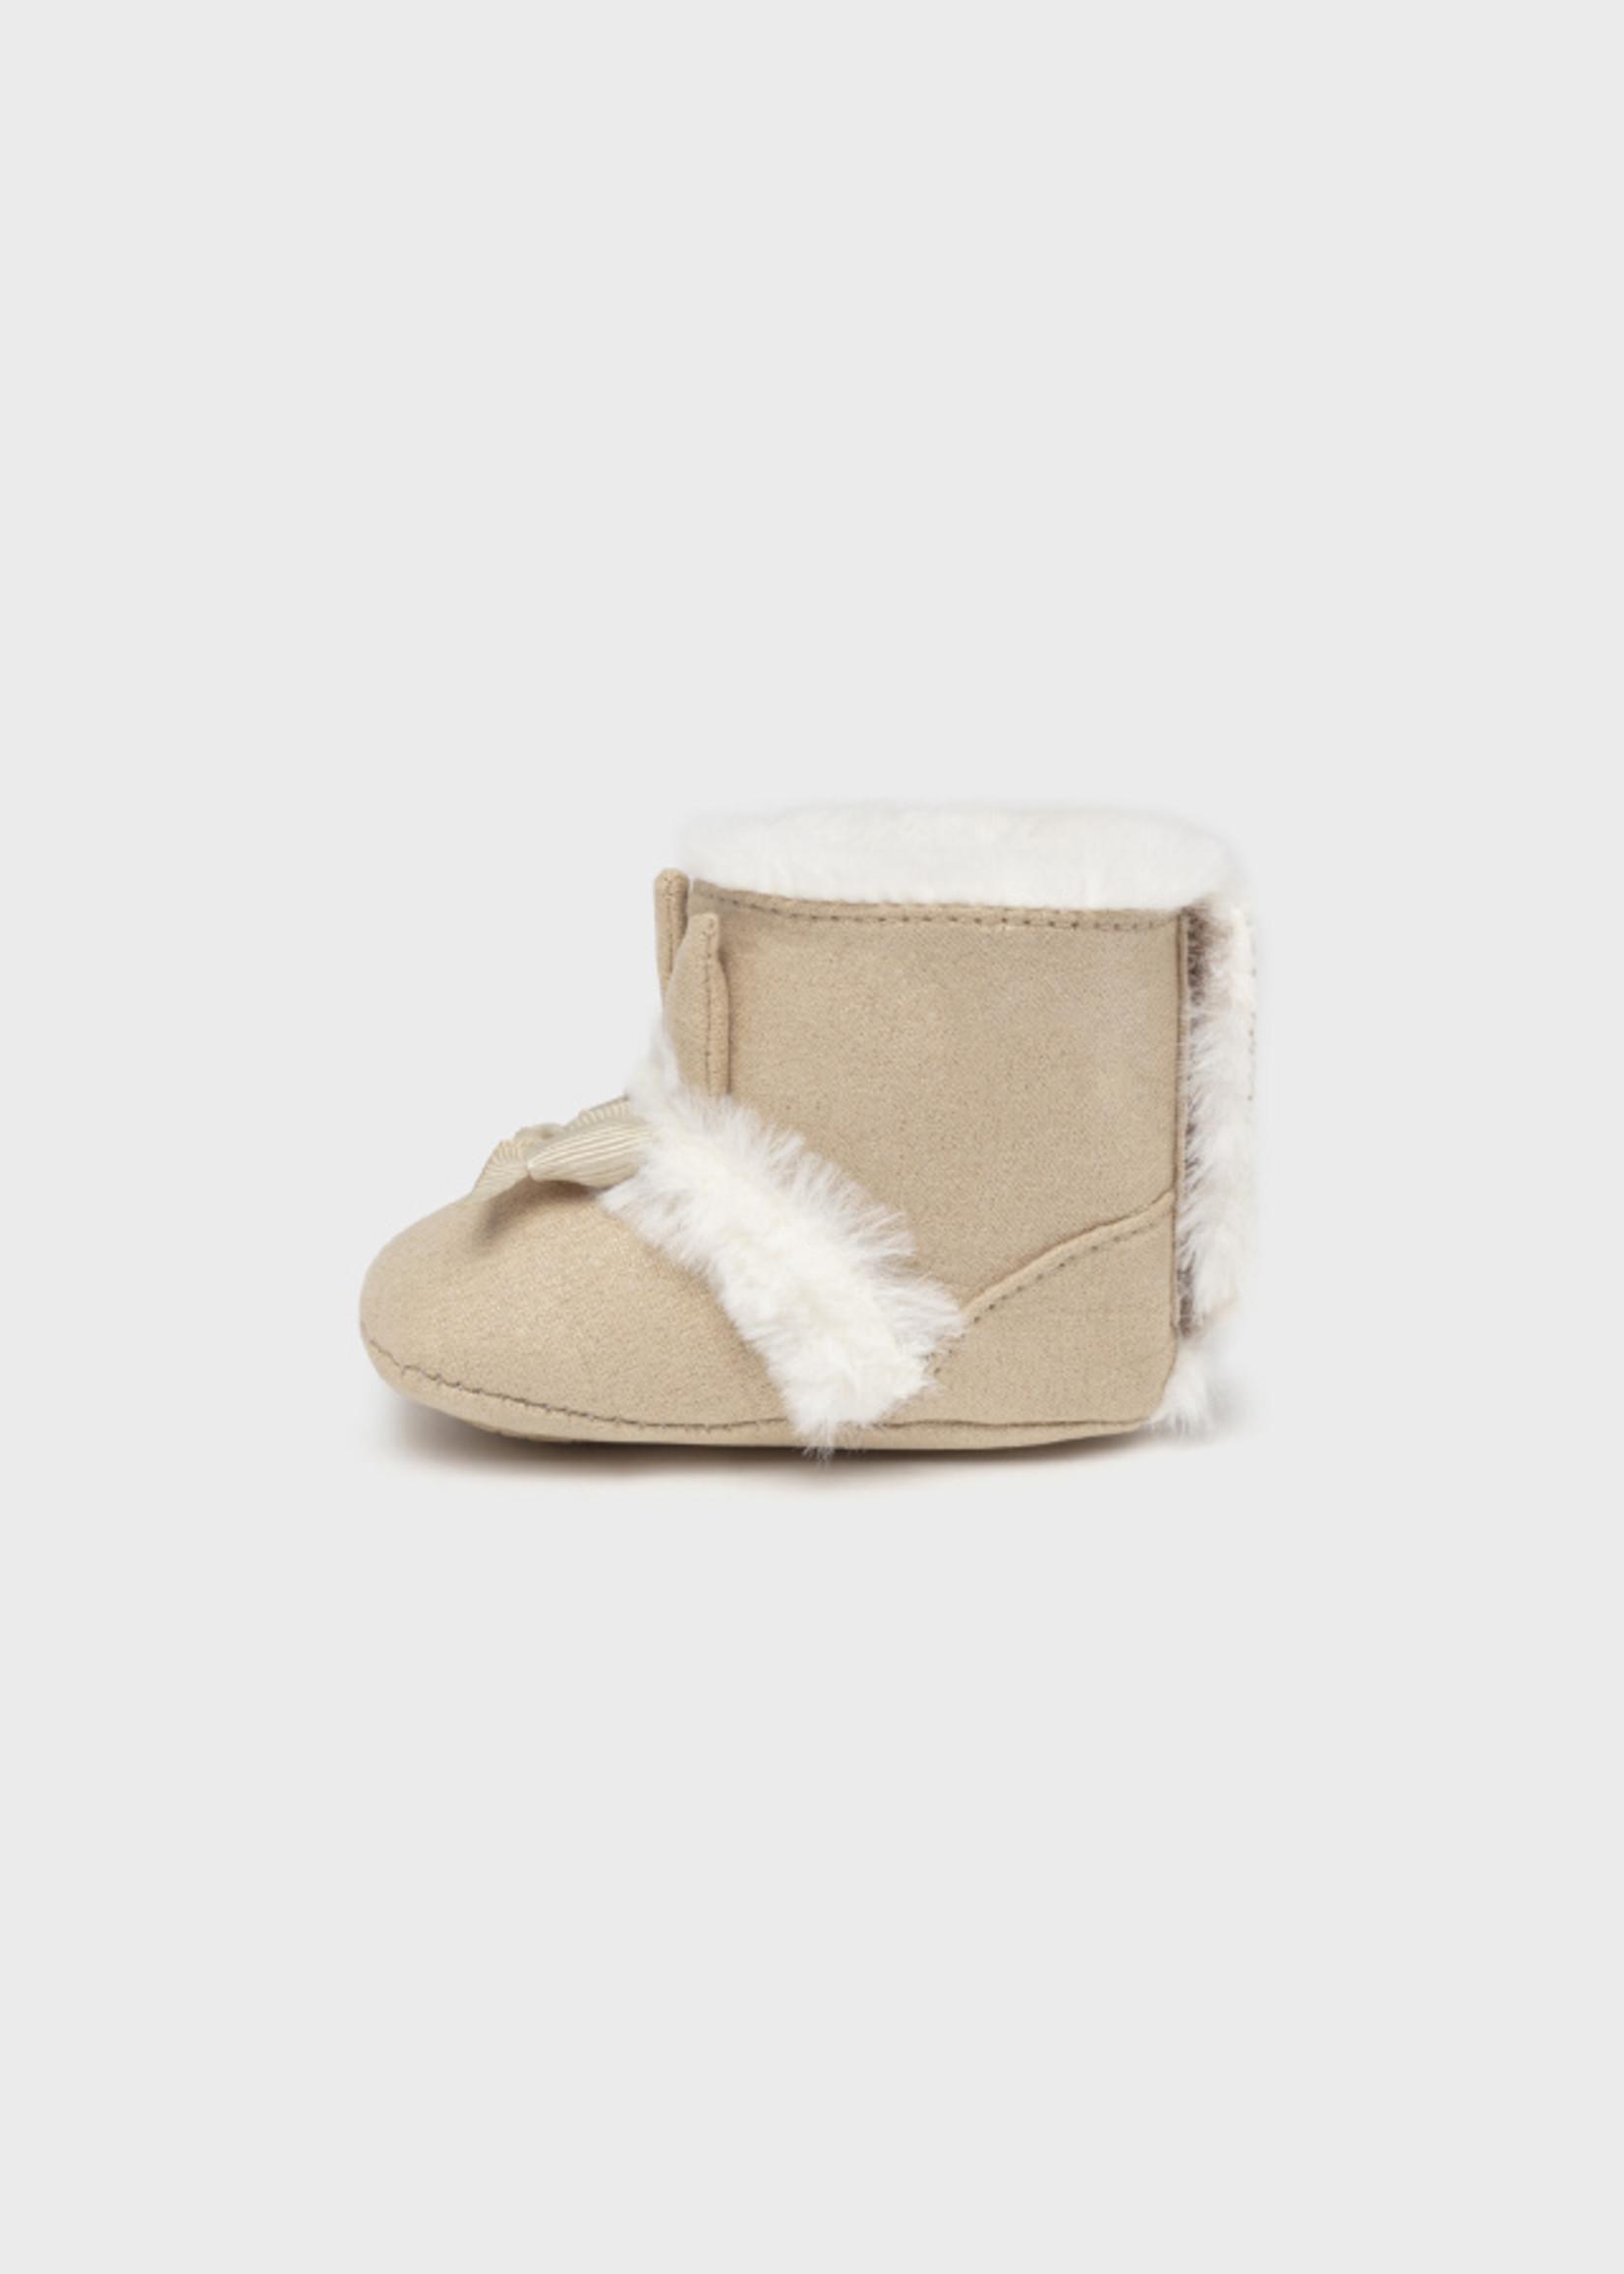 Mayoral Mayoral Faux fur boots beige